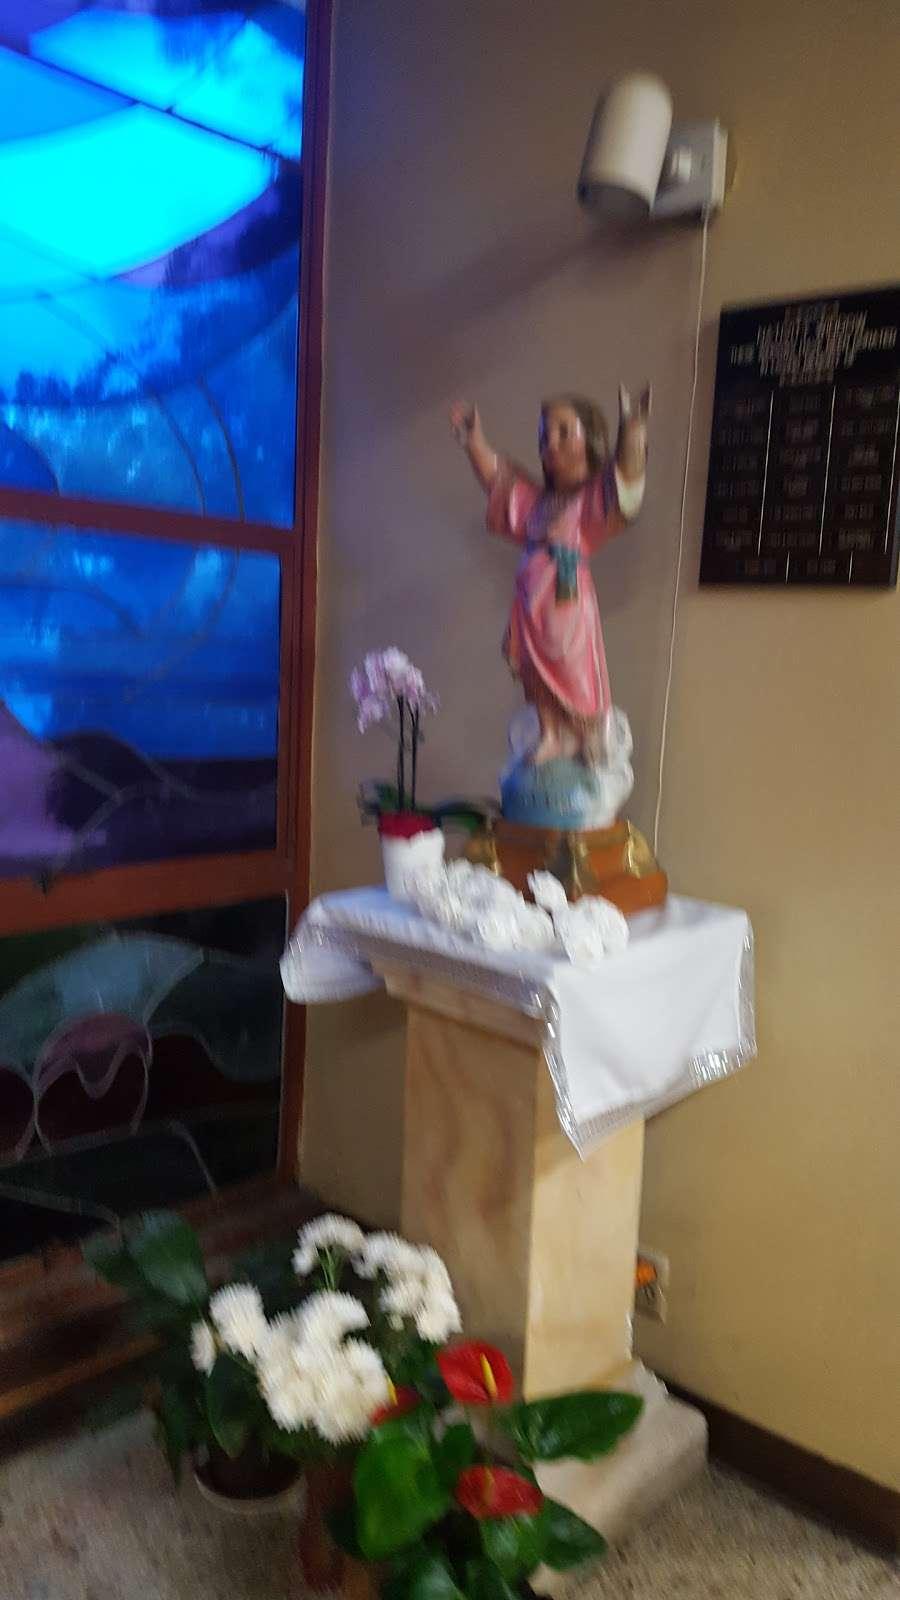 St. Catherine Laboure Church - church  | Photo 10 of 10 | Address: 3846 Redondo Beach Blvd, Torrance, CA 90504, USA | Phone: (310) 323-8900